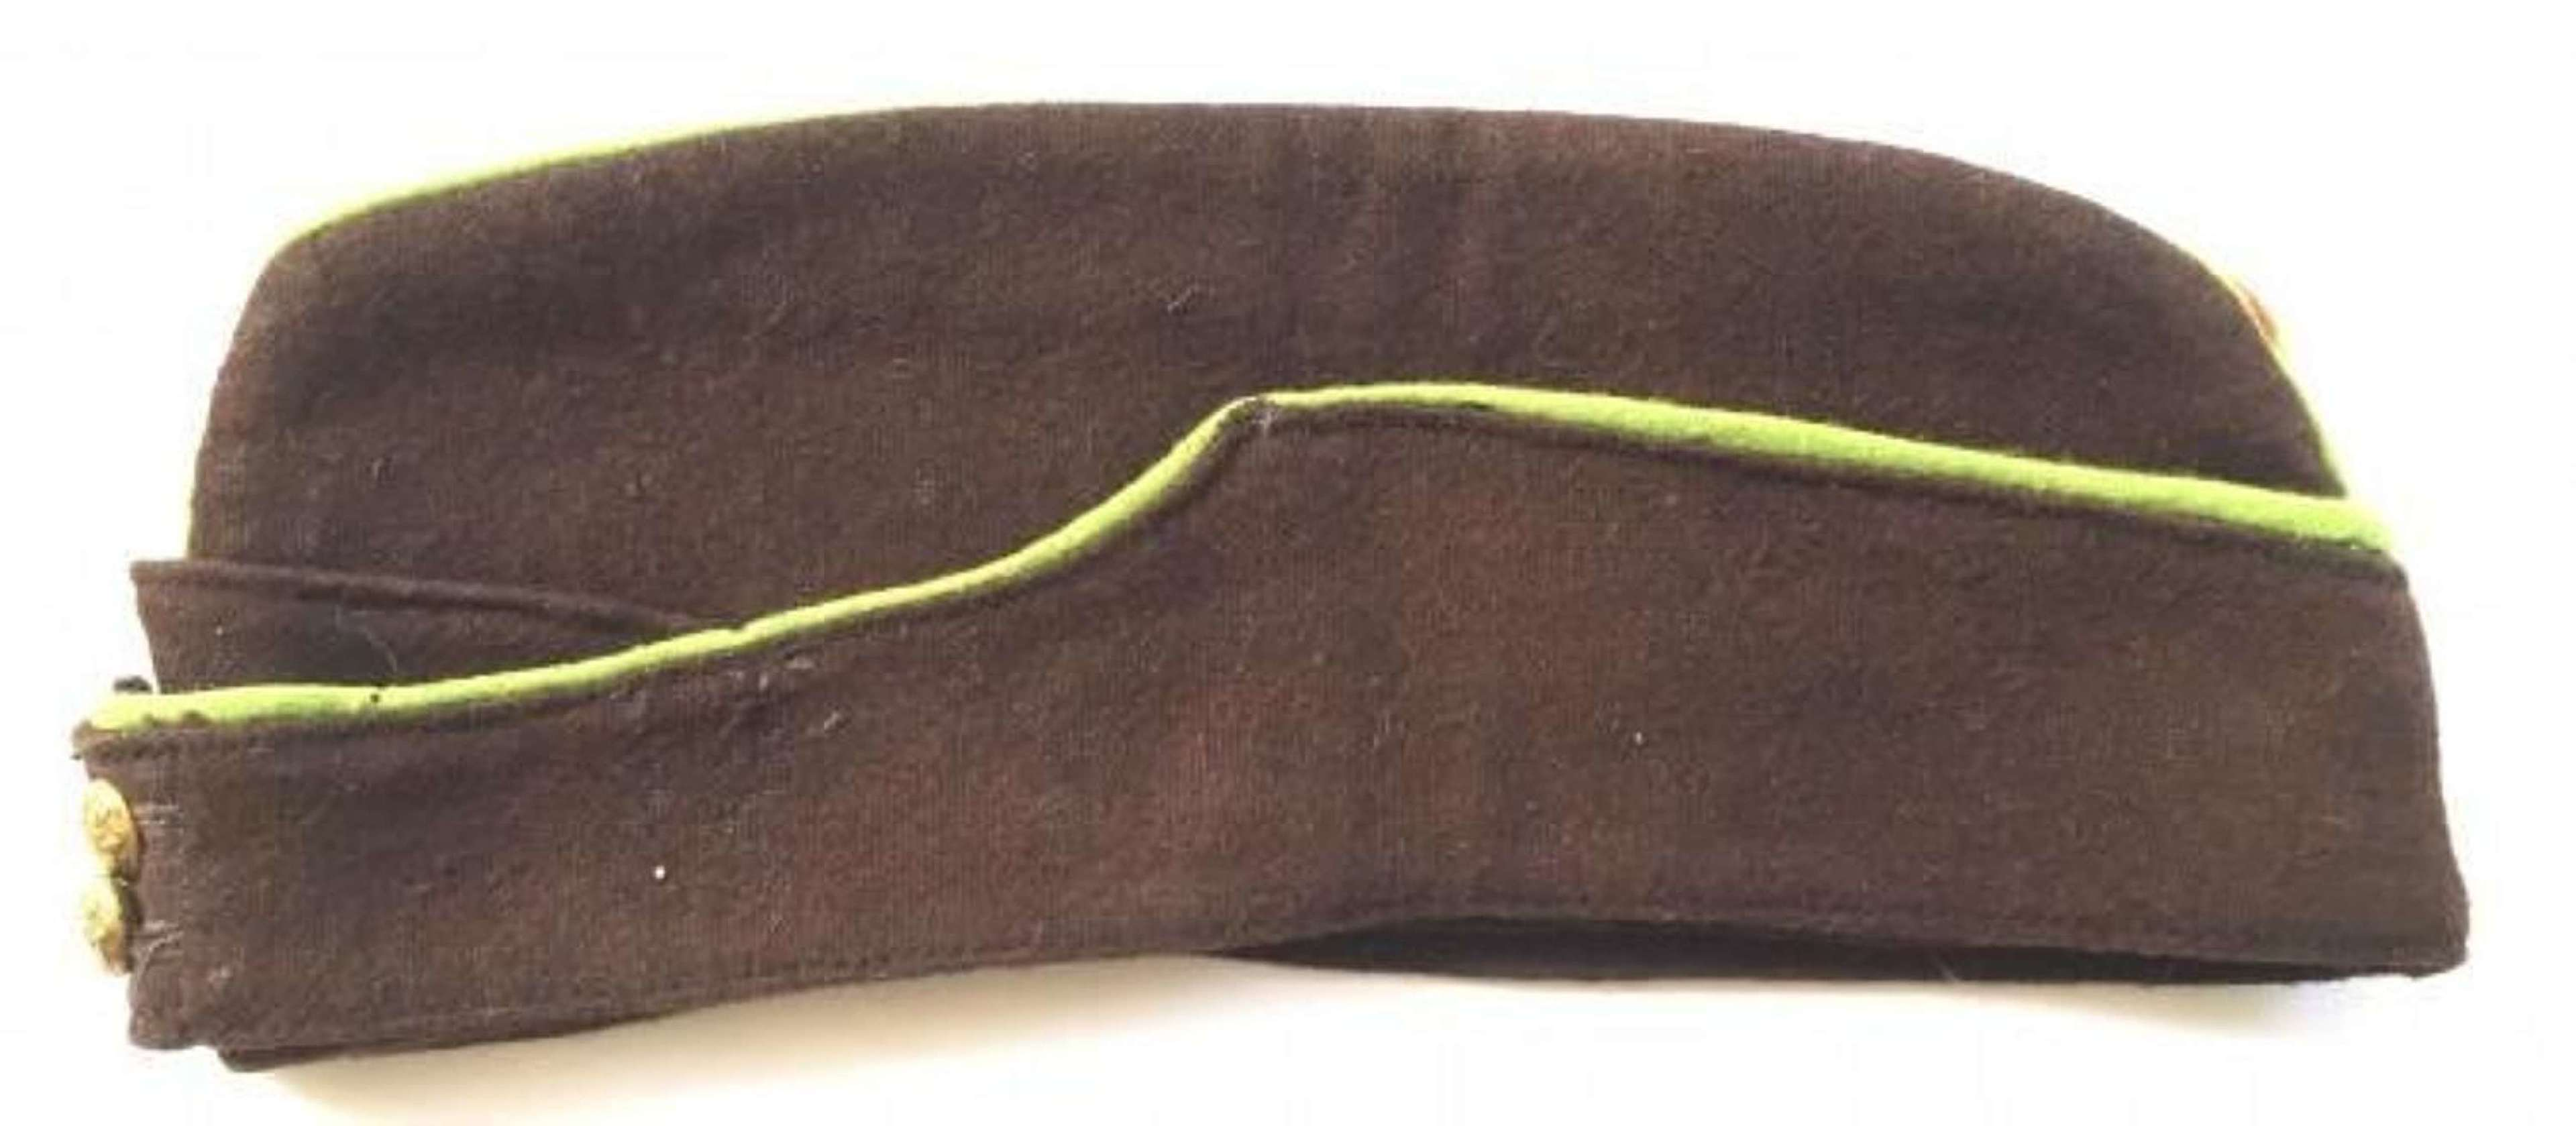 WW2 Period ATS Other Ranks Cap.